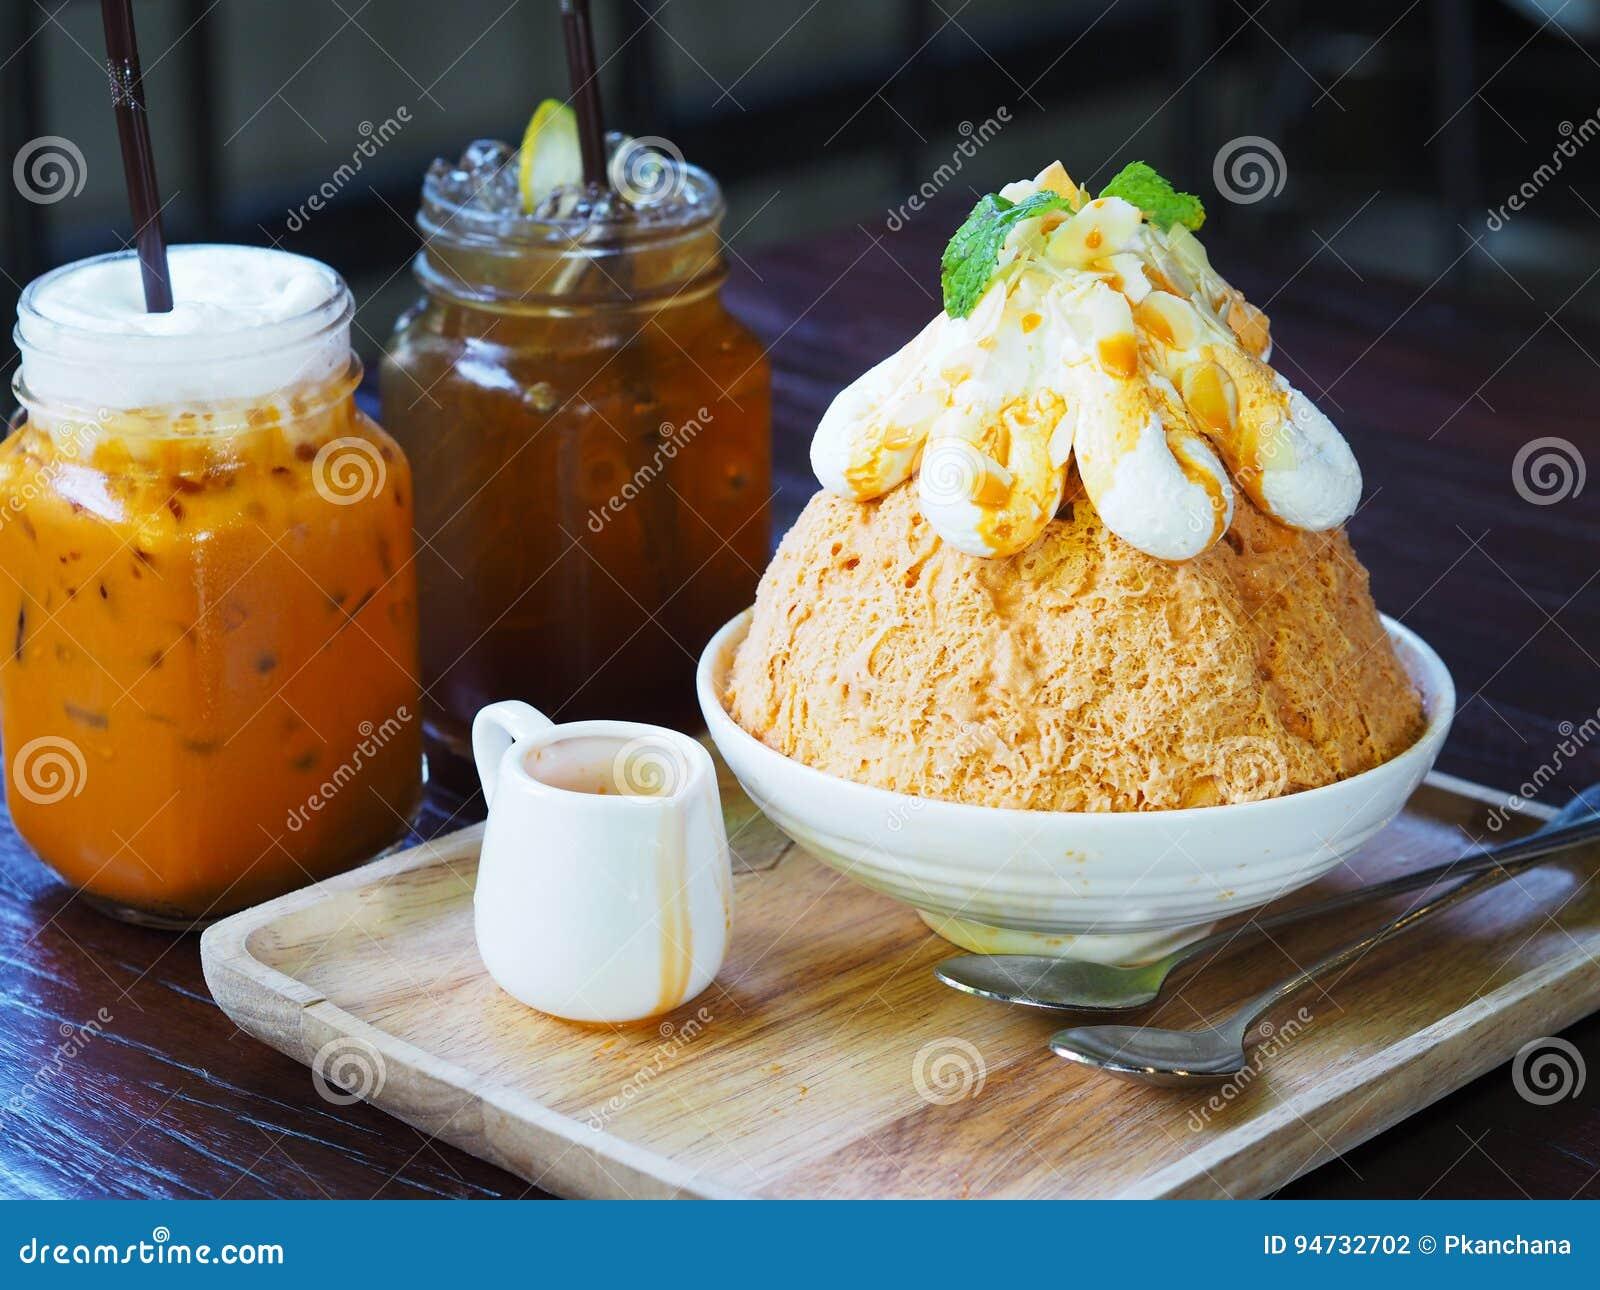 Milk Tea Bingsu Korean Dessert On Wooden Plate Stock Photo Image